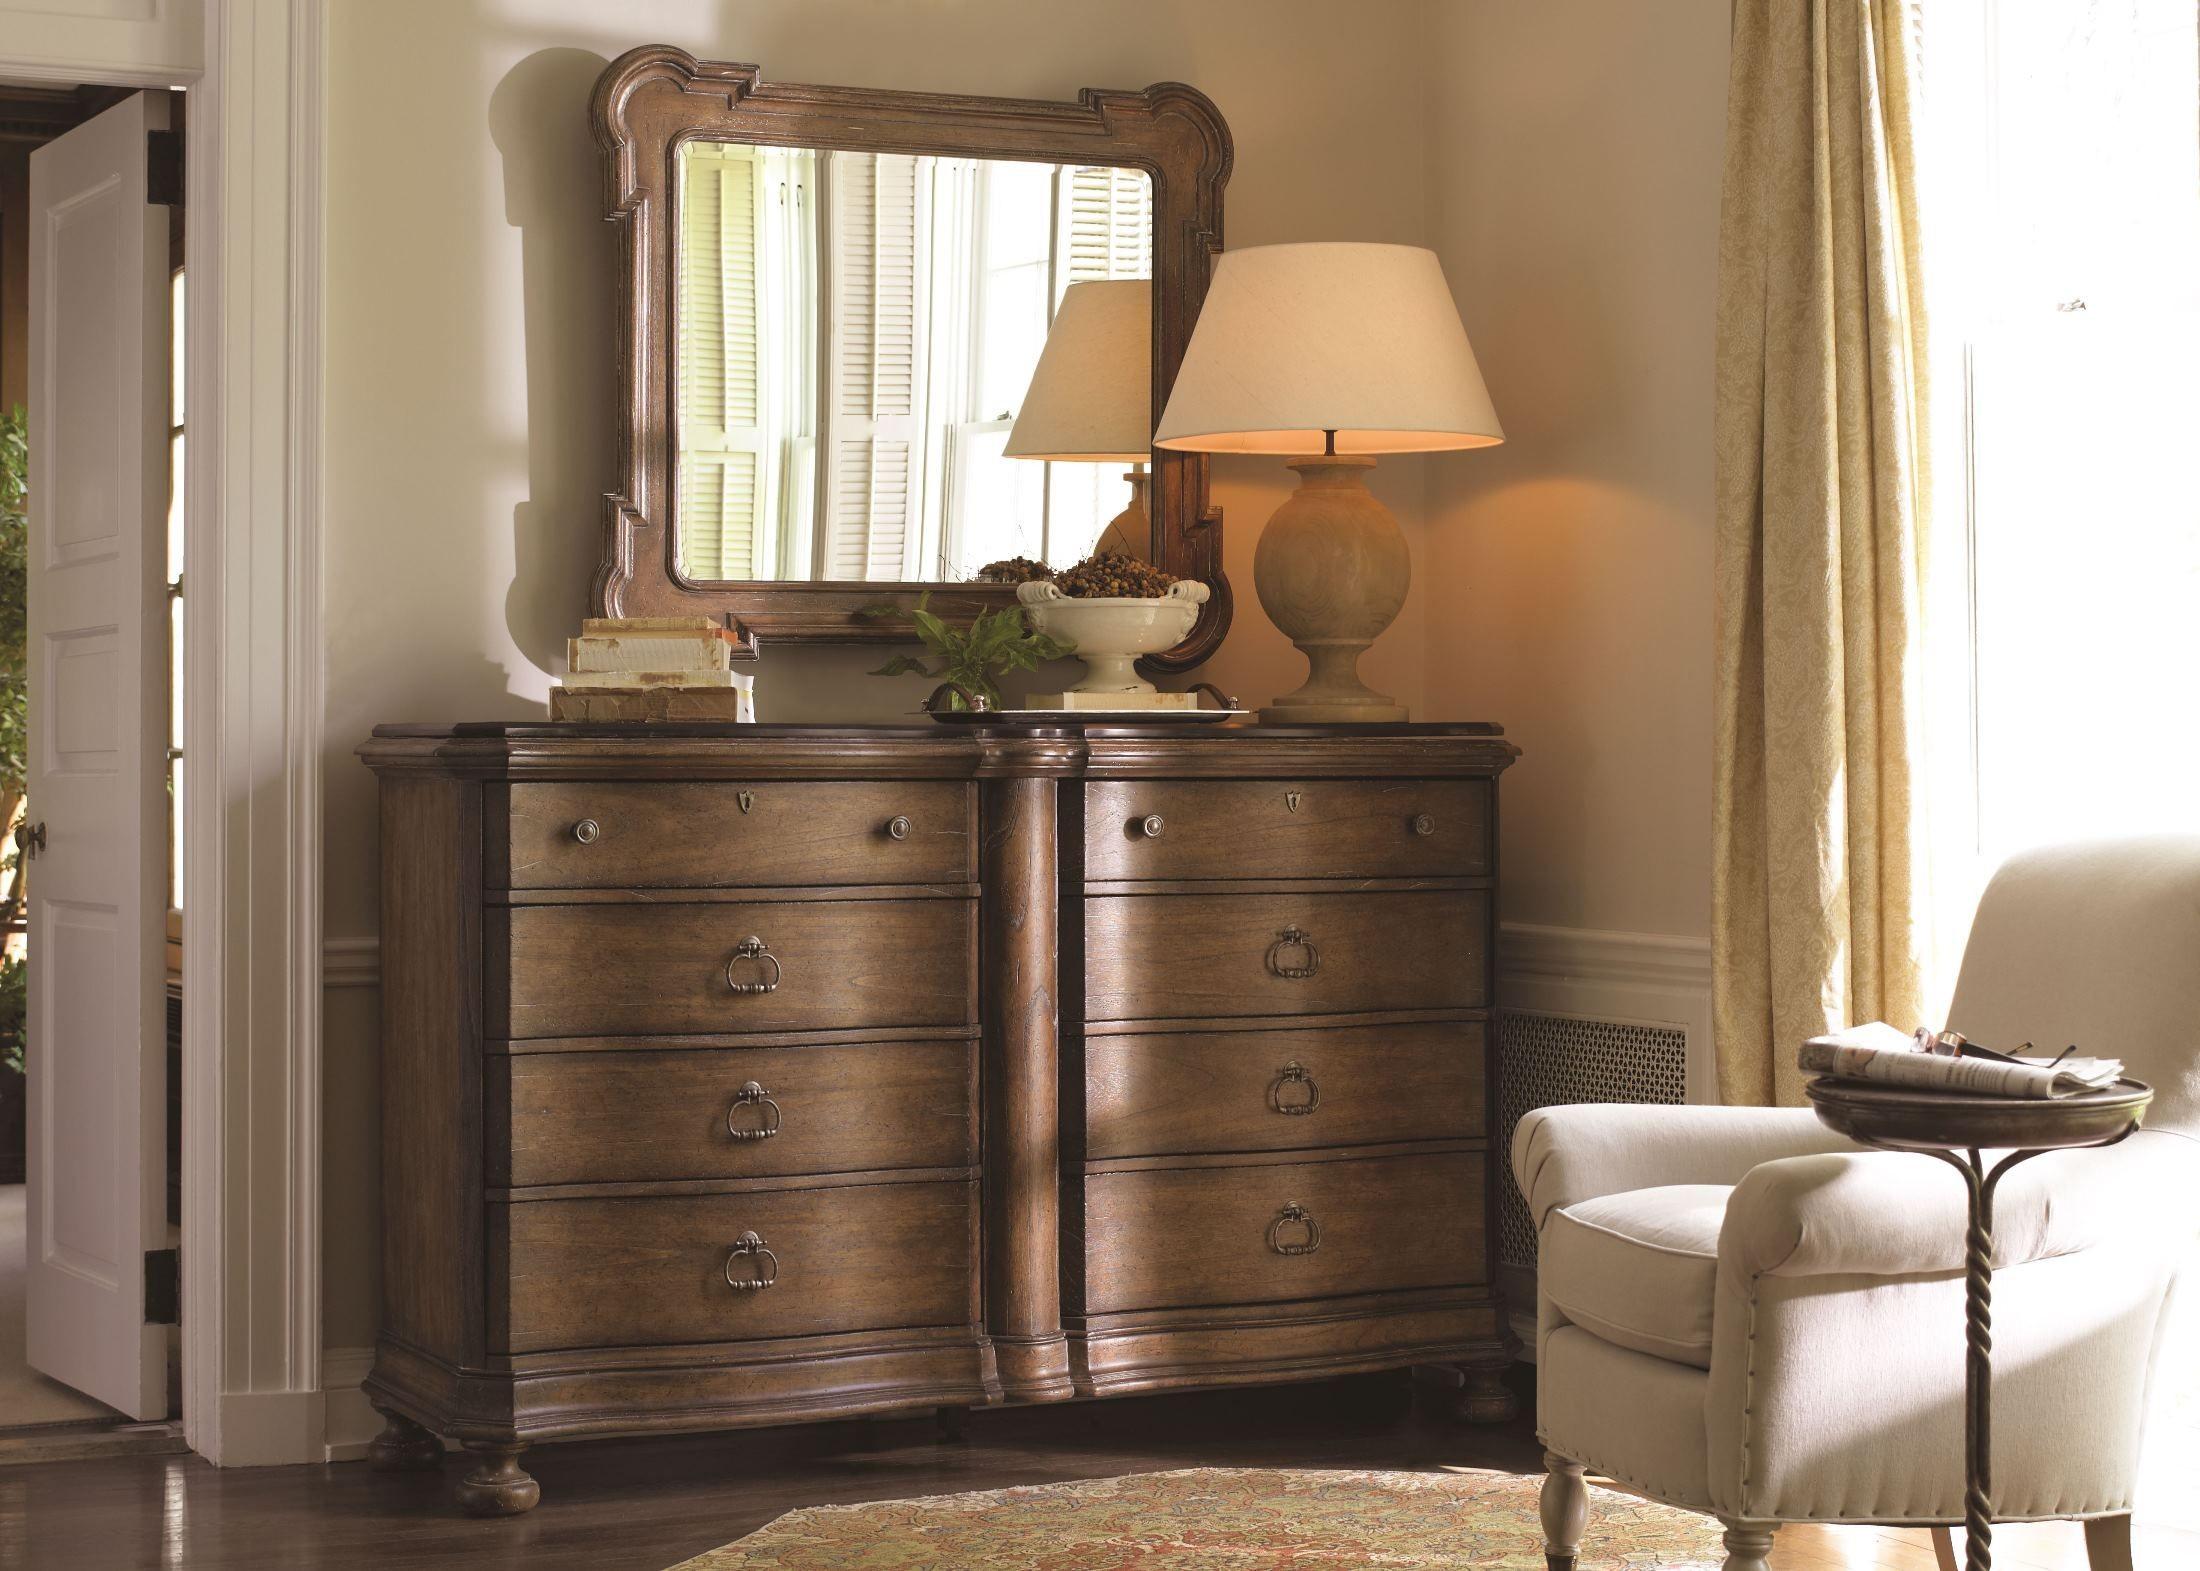 European Farmhouse Blond Upholstered Bedroom Set 018 63 42 Stanley Furniture